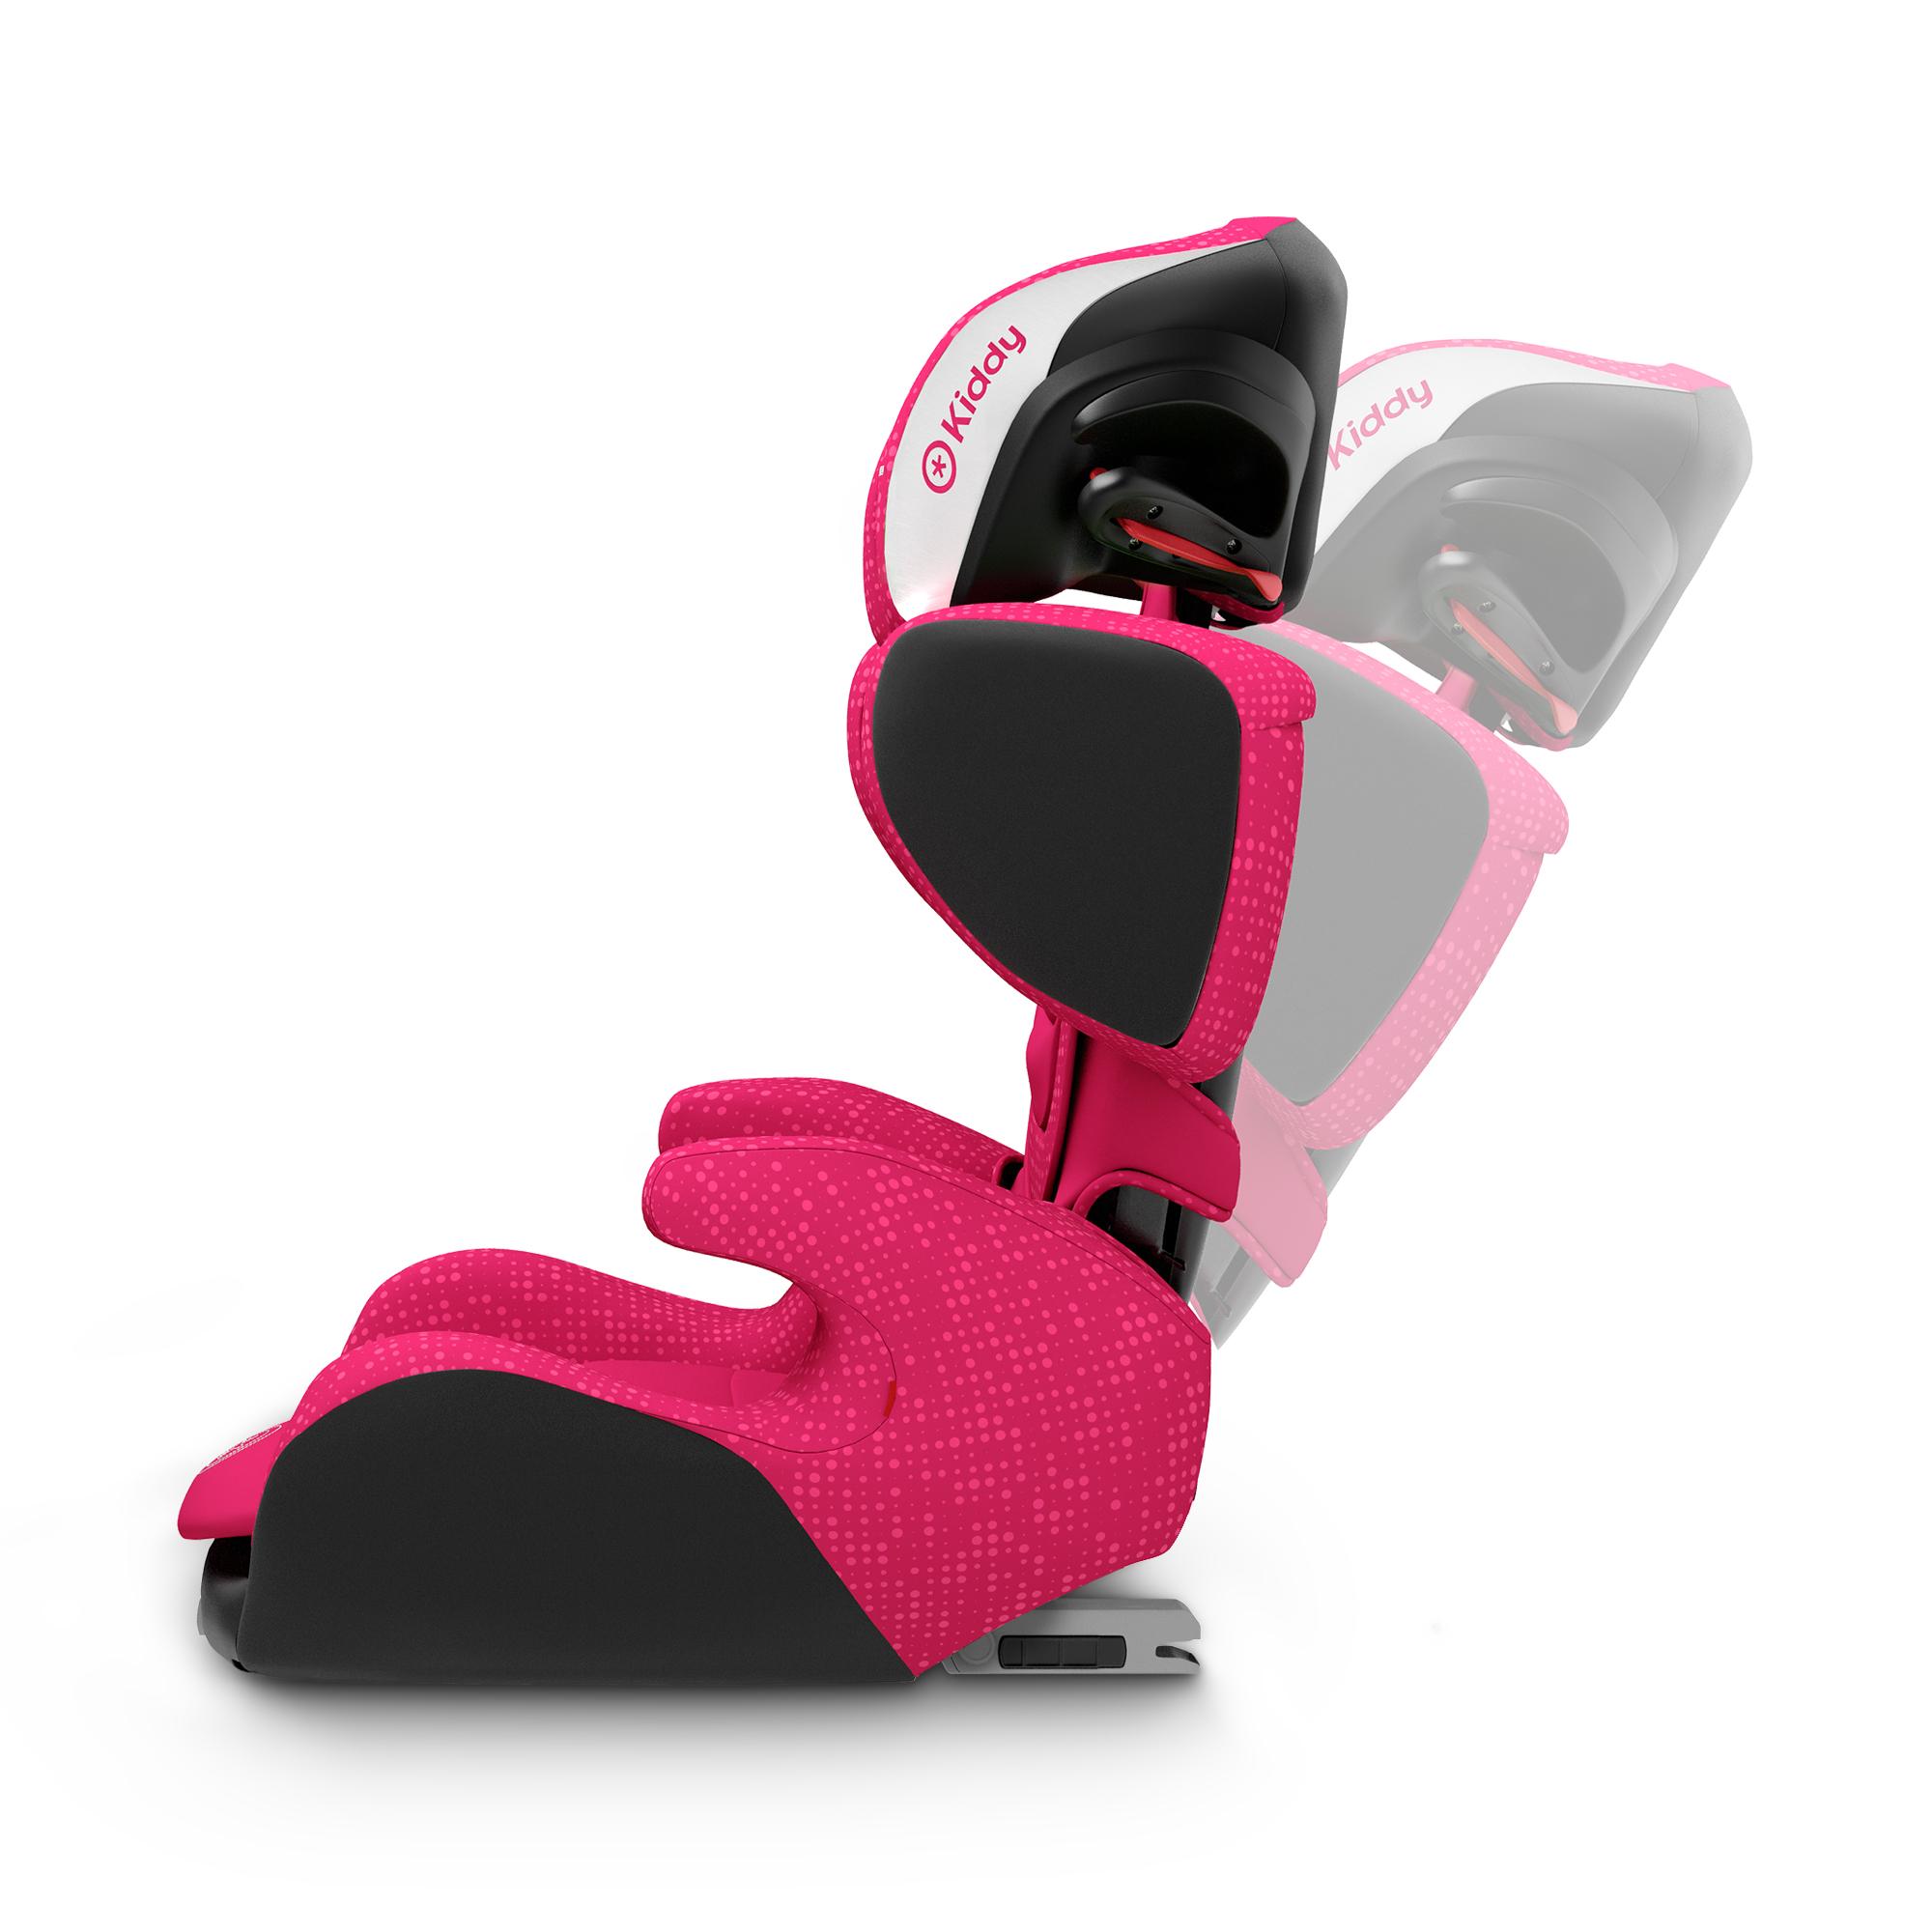 Kiddy Child Car Seat Cruiserfix 3 2019 Rubin Pink Buy At